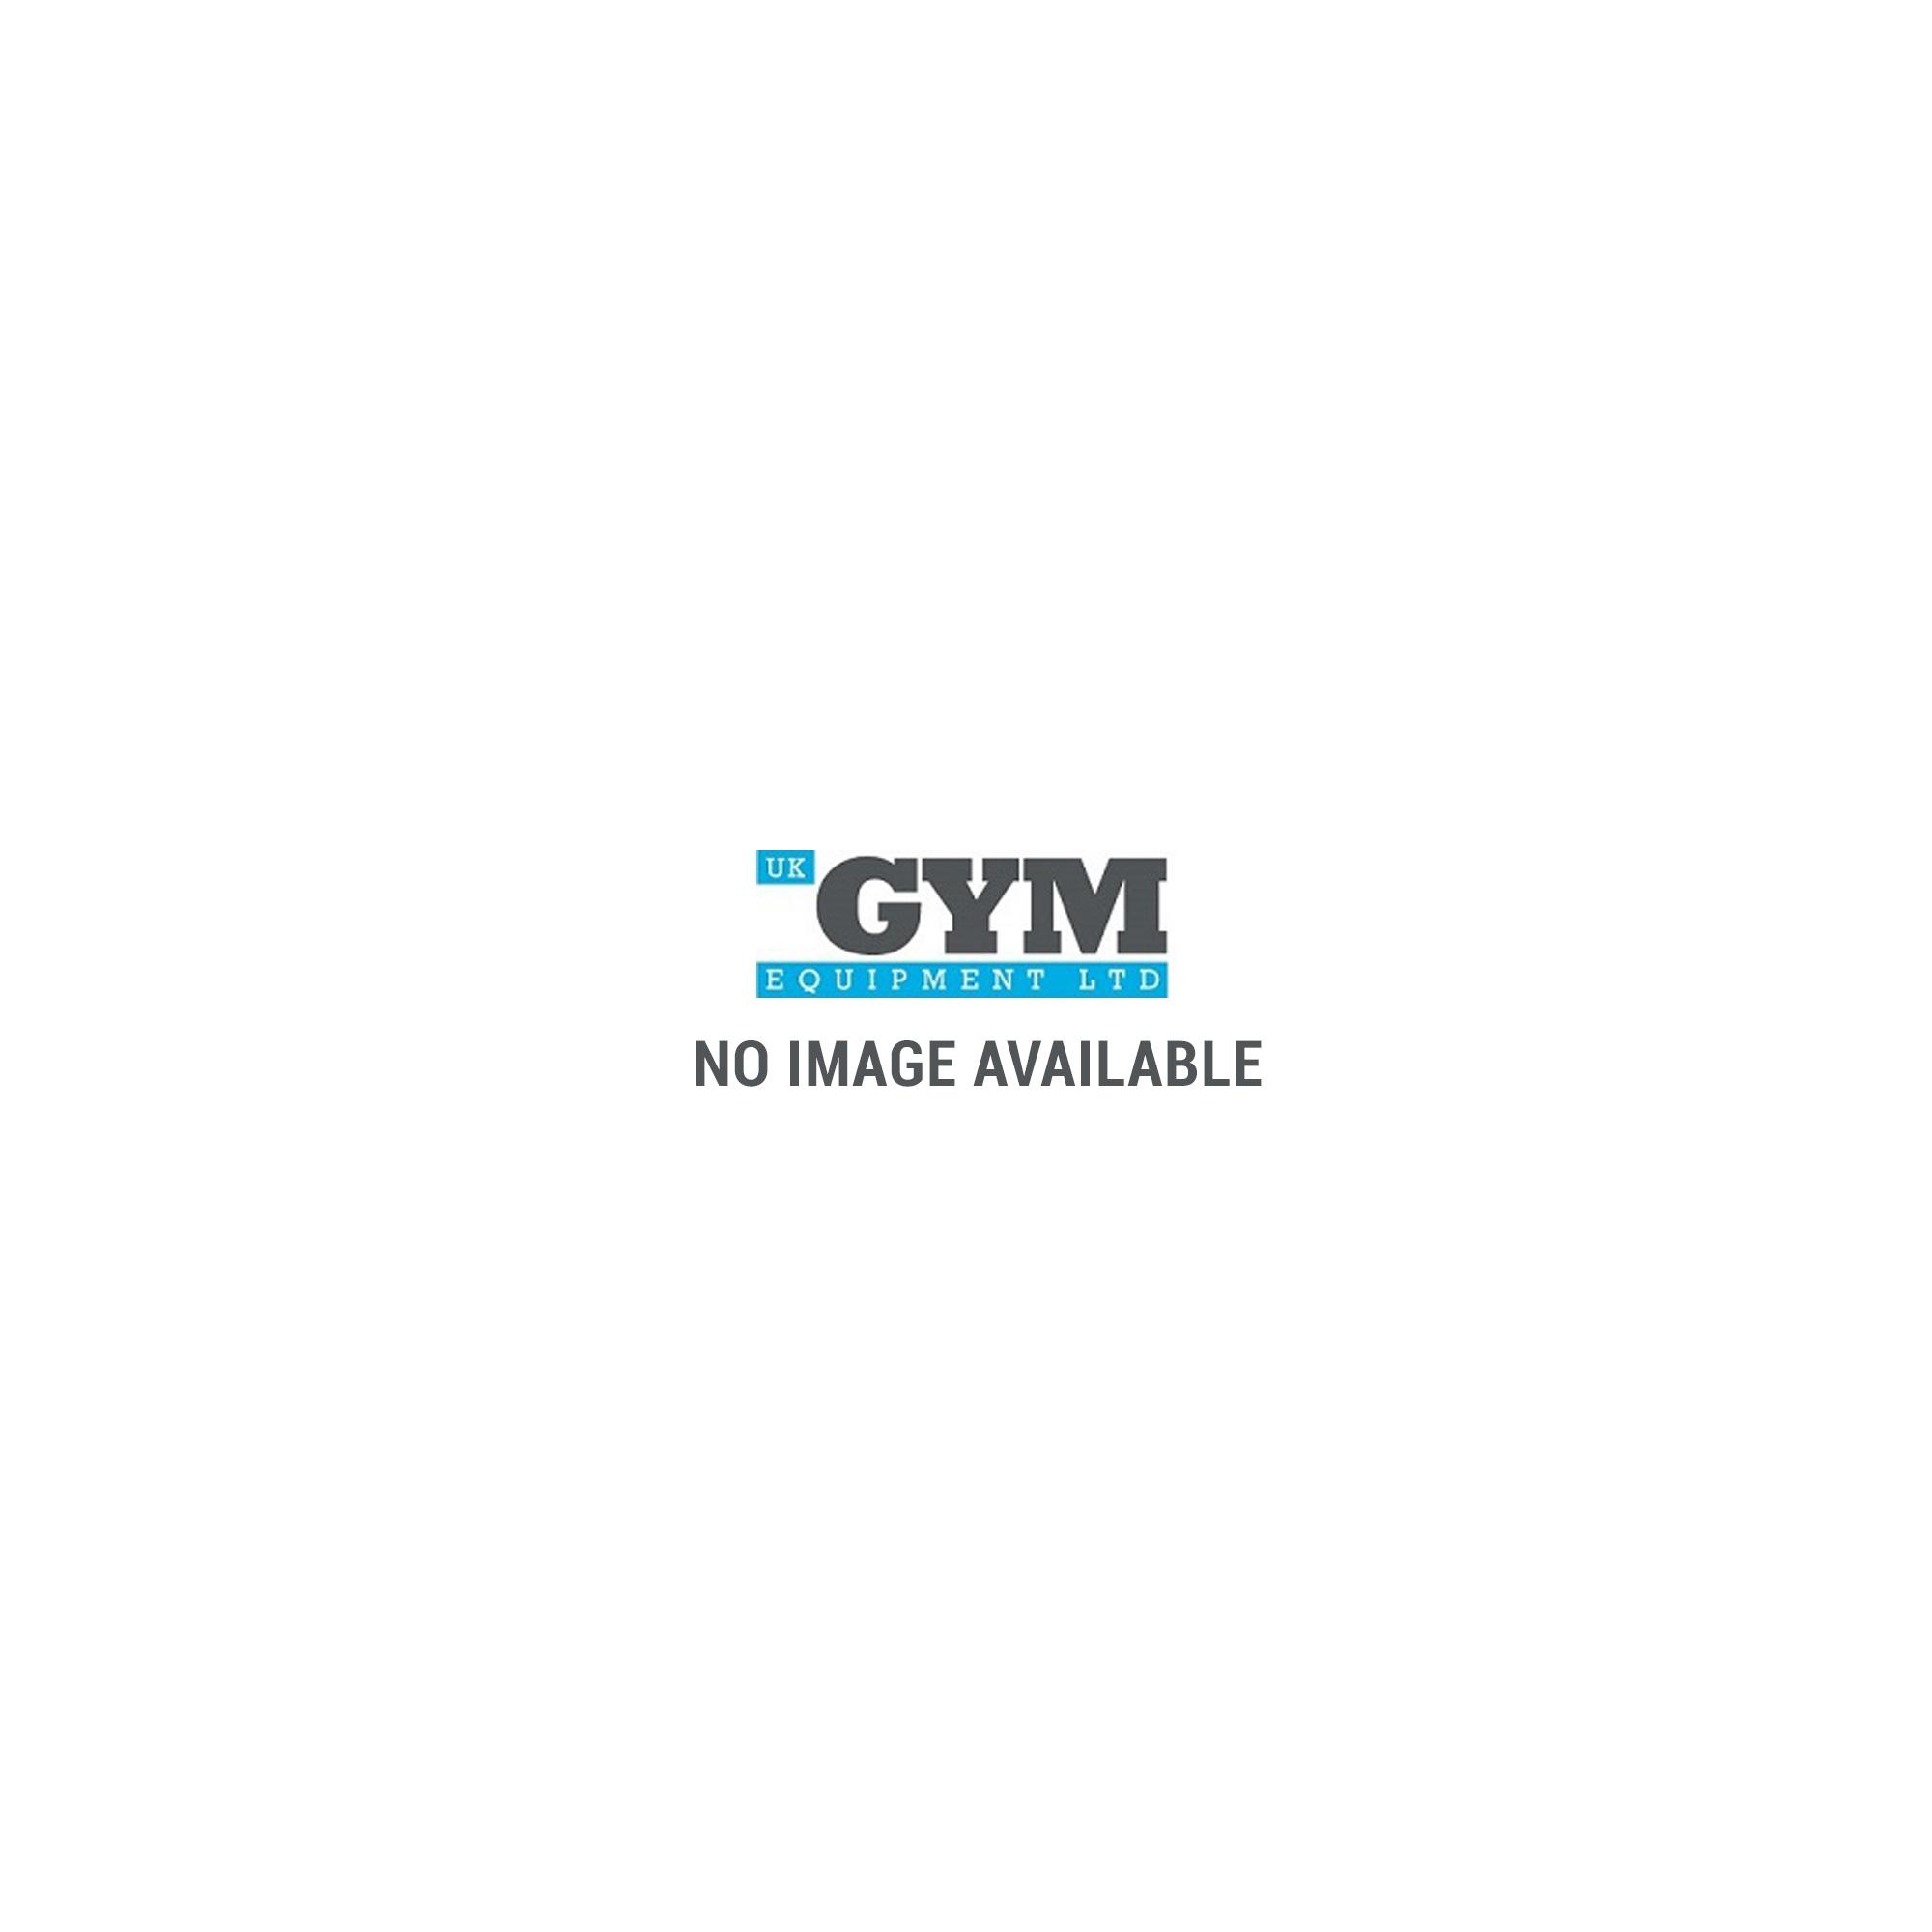 Olympic Squat Rack - Strength Training from UK Gym Equipment Ltd UK